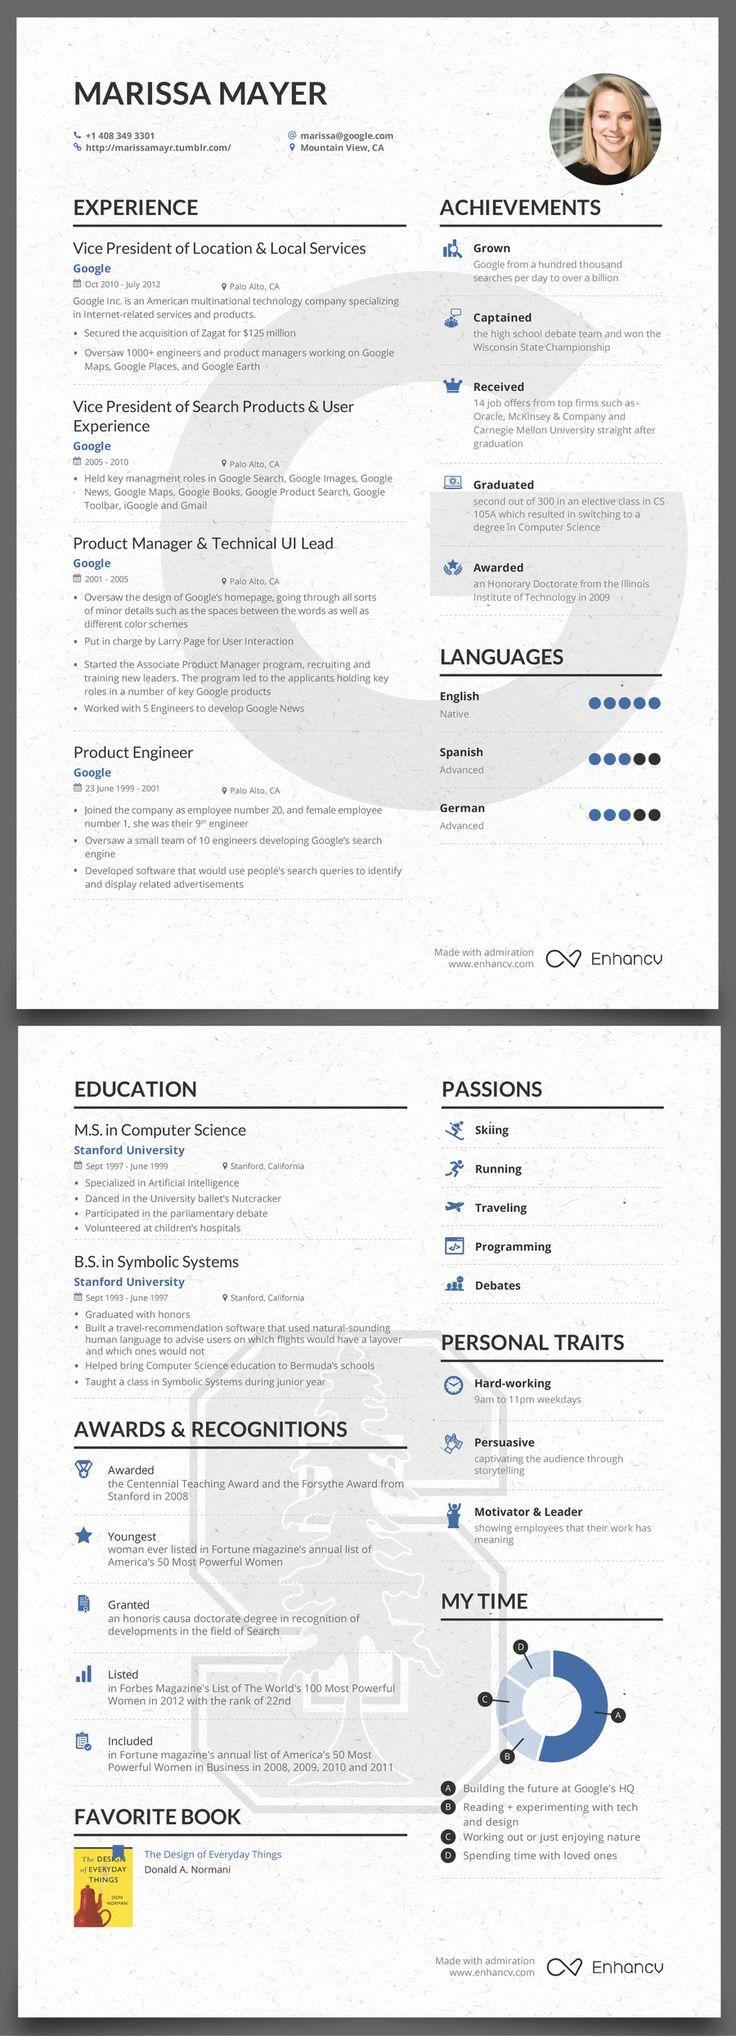 Marissa Mayer CV Resume writing examples, Teaching